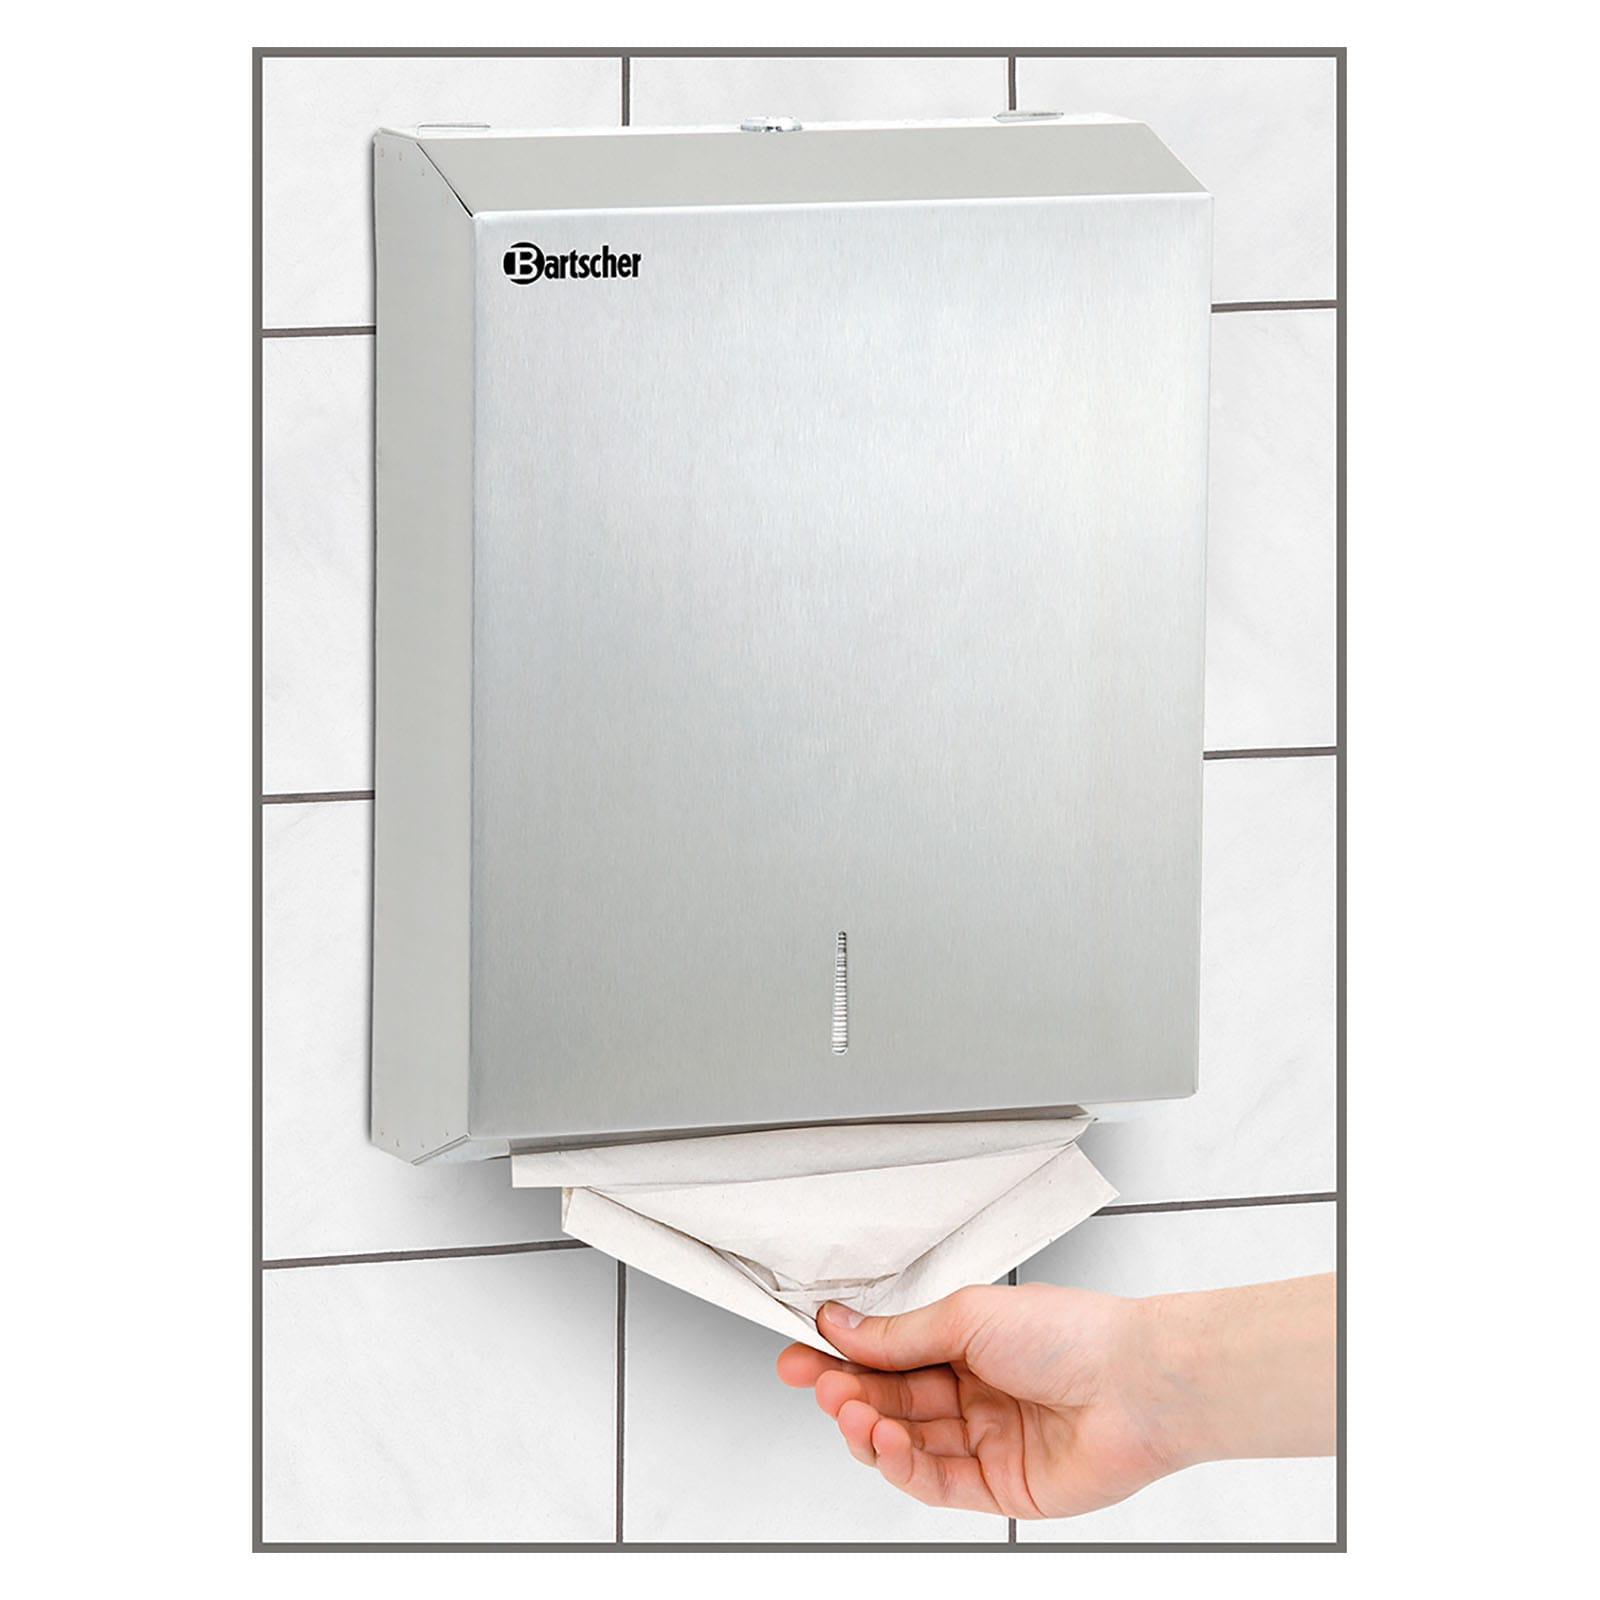 Papieren handdoekdispensers